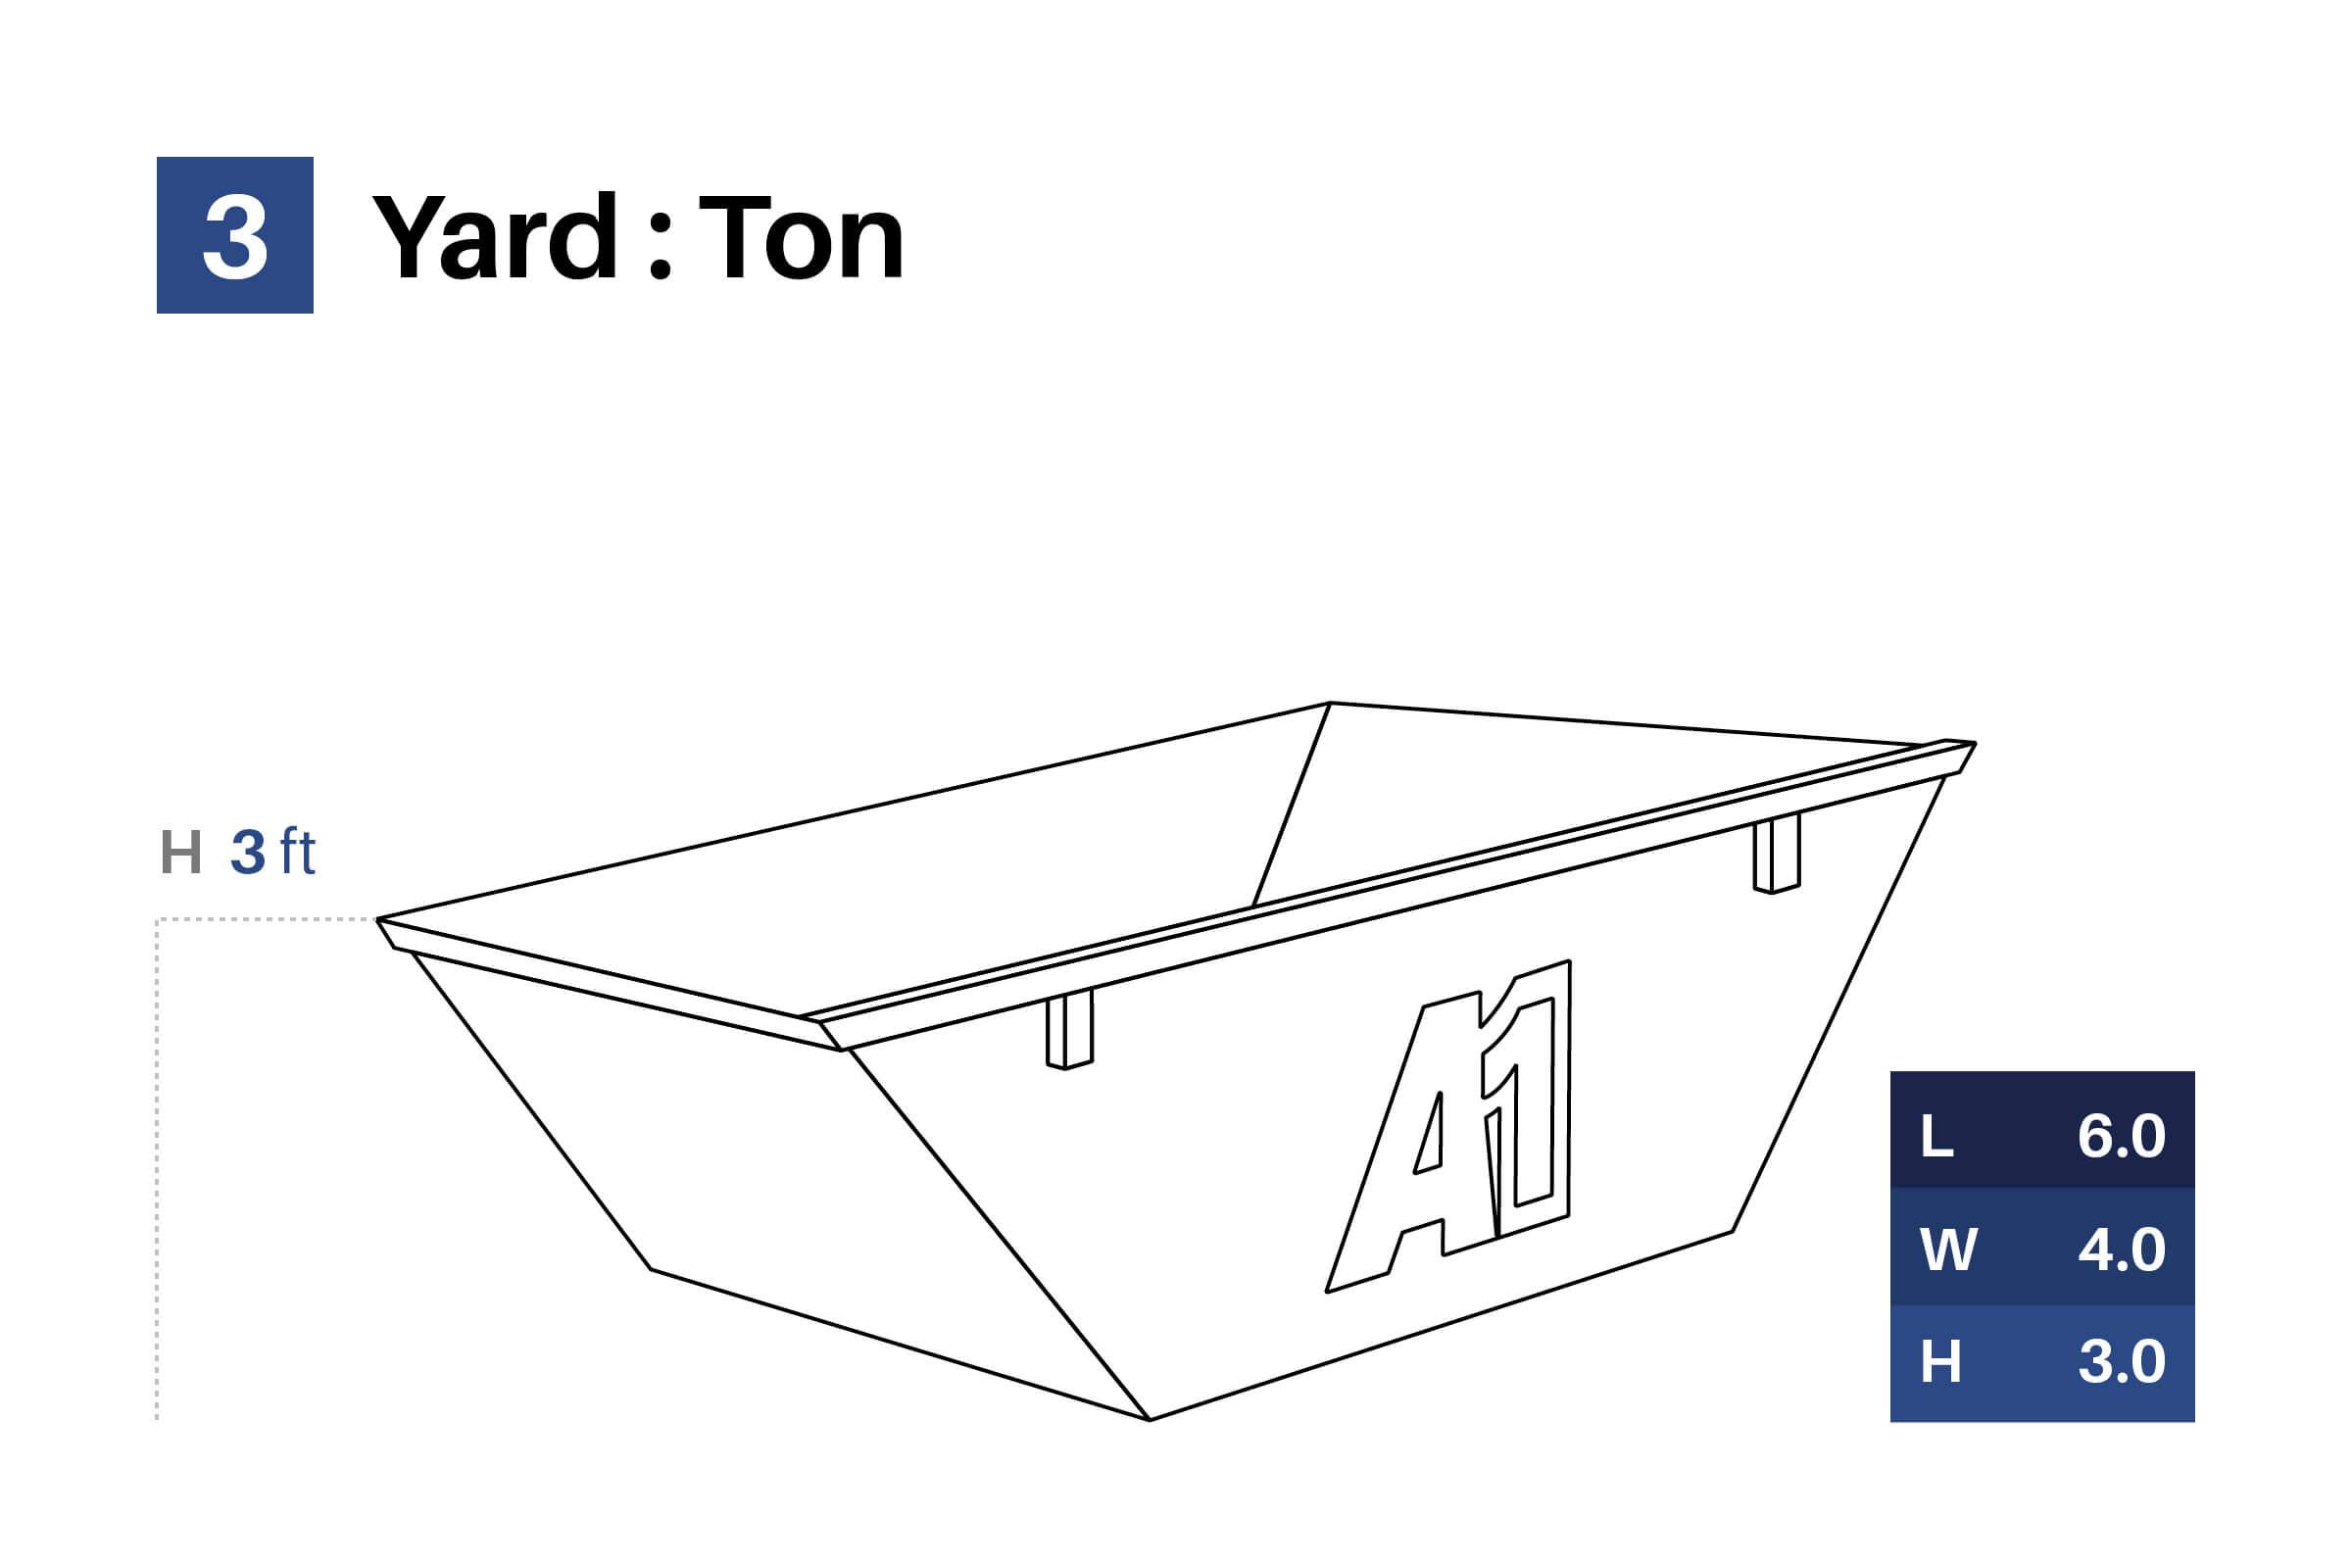 a1skip-hire-3yard